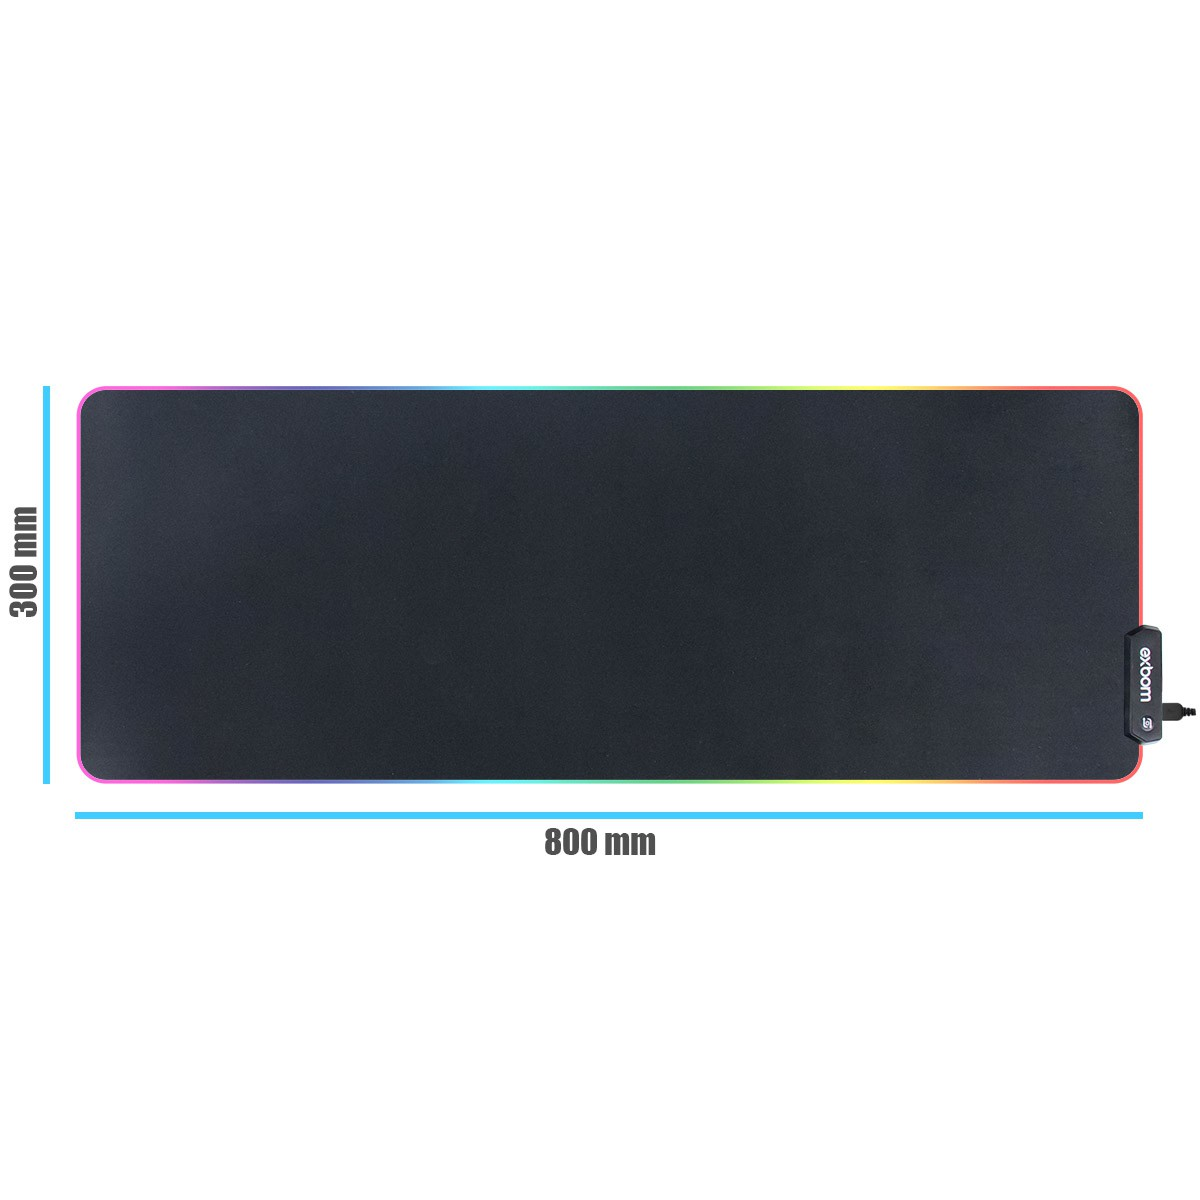 KIT Teclado Gamer Semi Mecânico com LED BM-T06 + Mouse Pad Gamer com LED Extra Grande 300x800x4mm